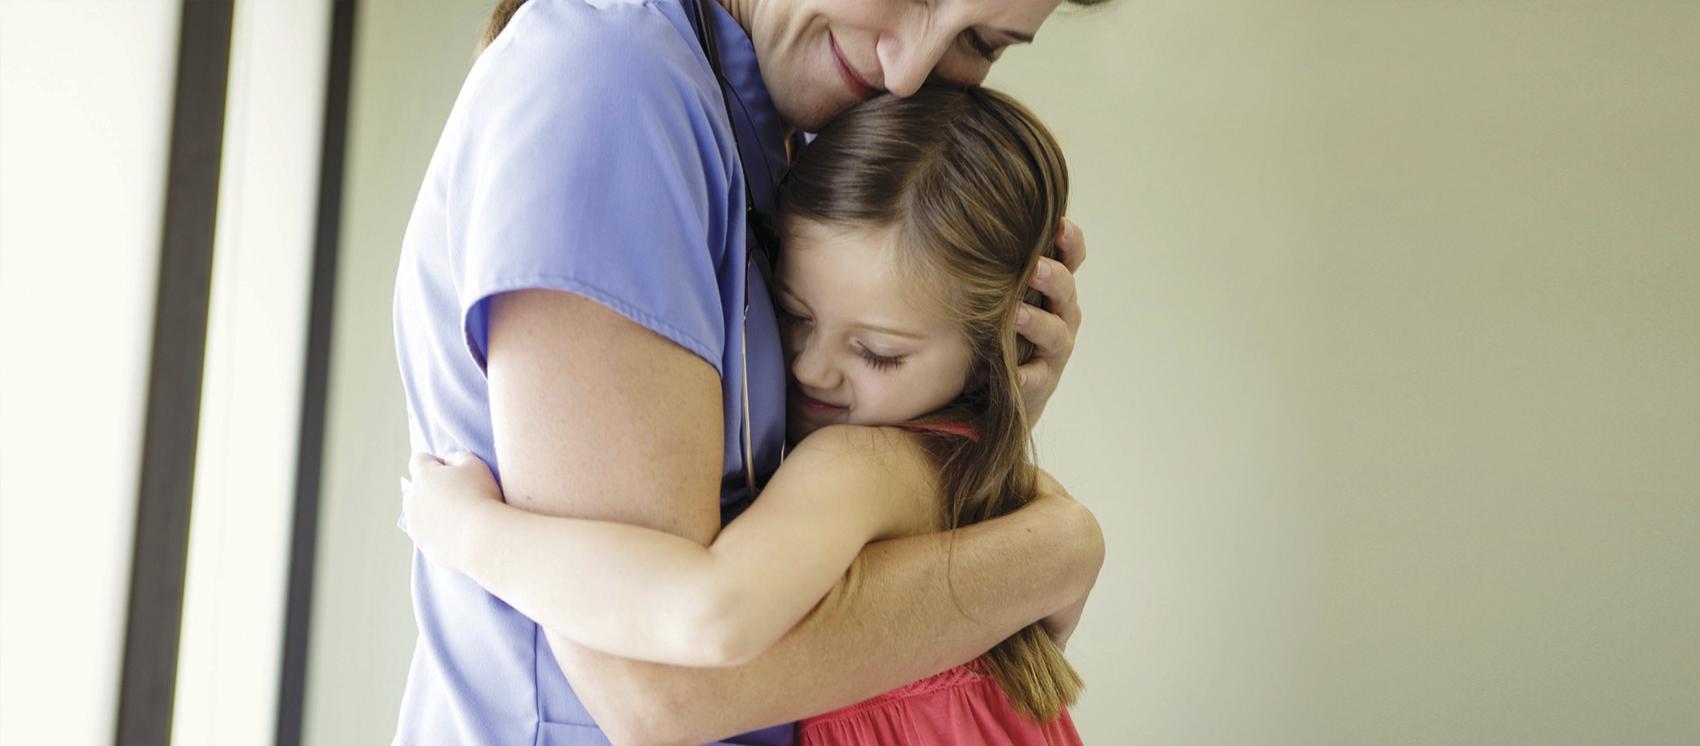 Dignity Health | Hello humankindness | (415) 438-5500